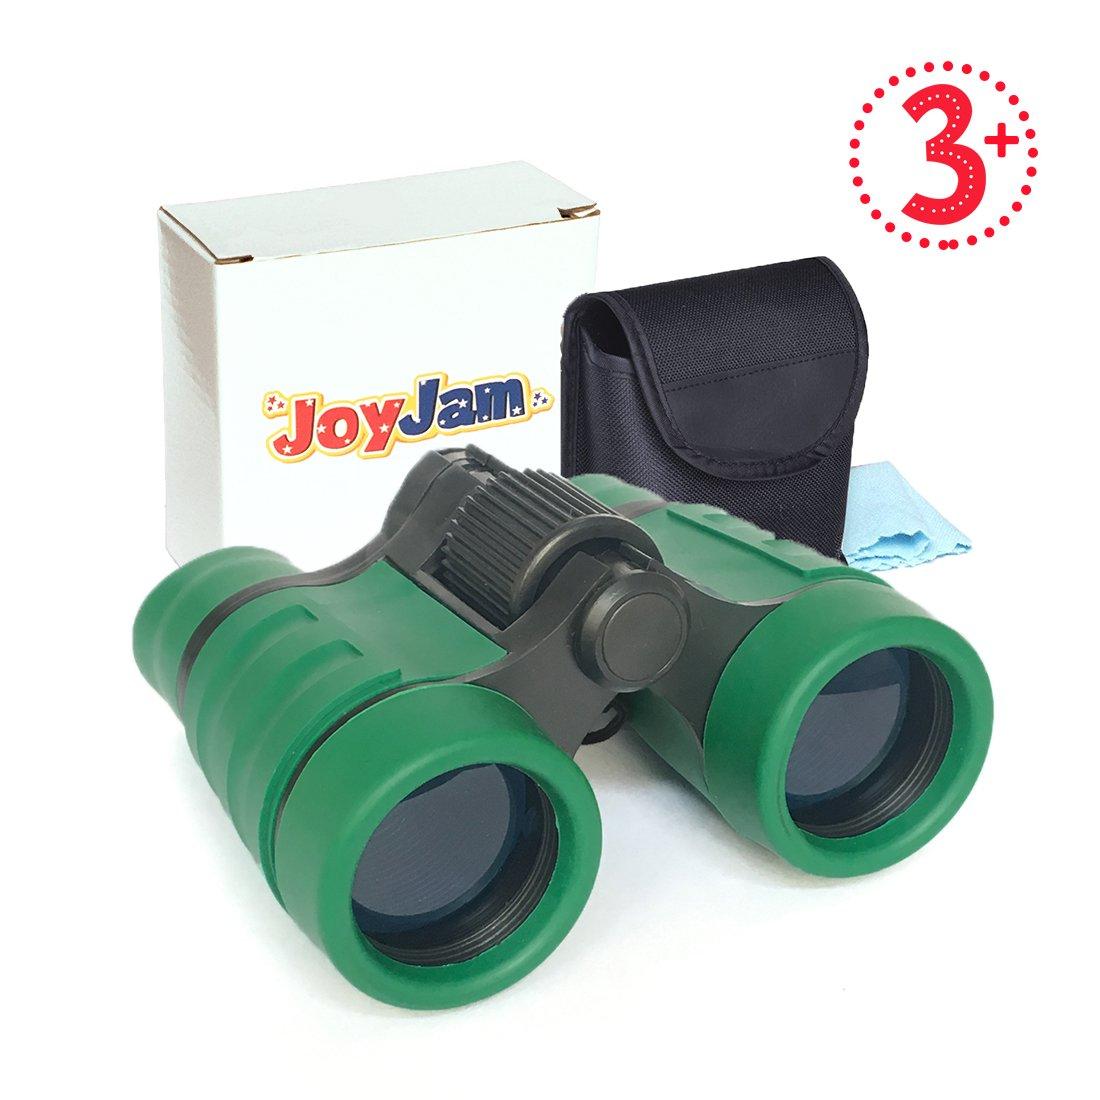 Joyjamコンパクト耐衝撃子供用双眼鏡、Best Gift For Boys & Girls (マルチカラー) B0792VNLFH グリーン グリーン